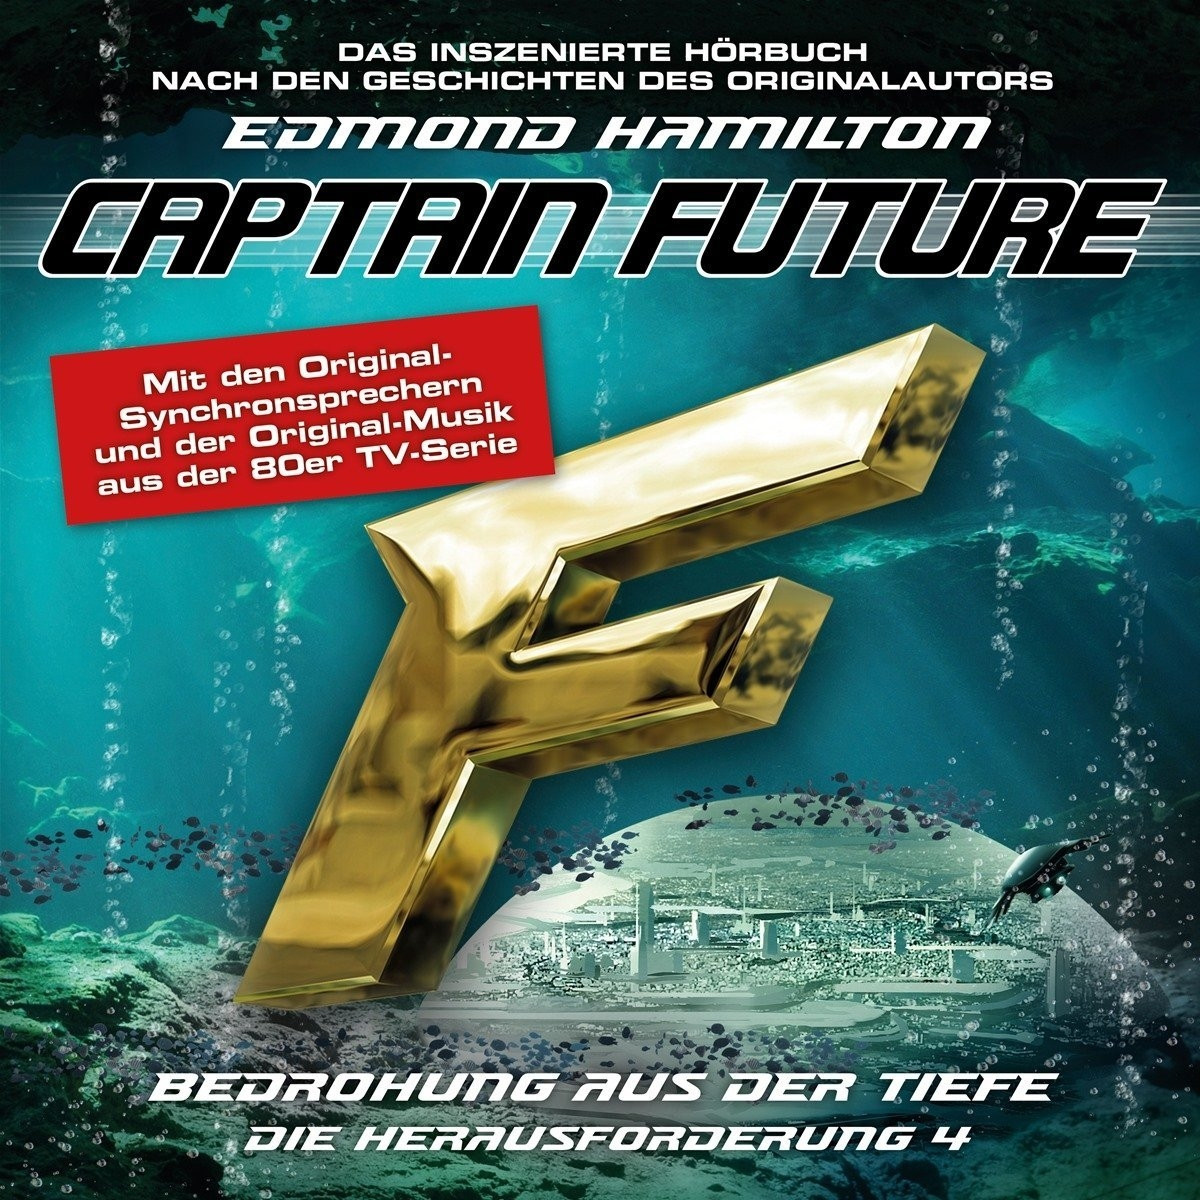 Captain Future: Die Herausforderung - Folge 04 Bedrohung aus der Tiefe